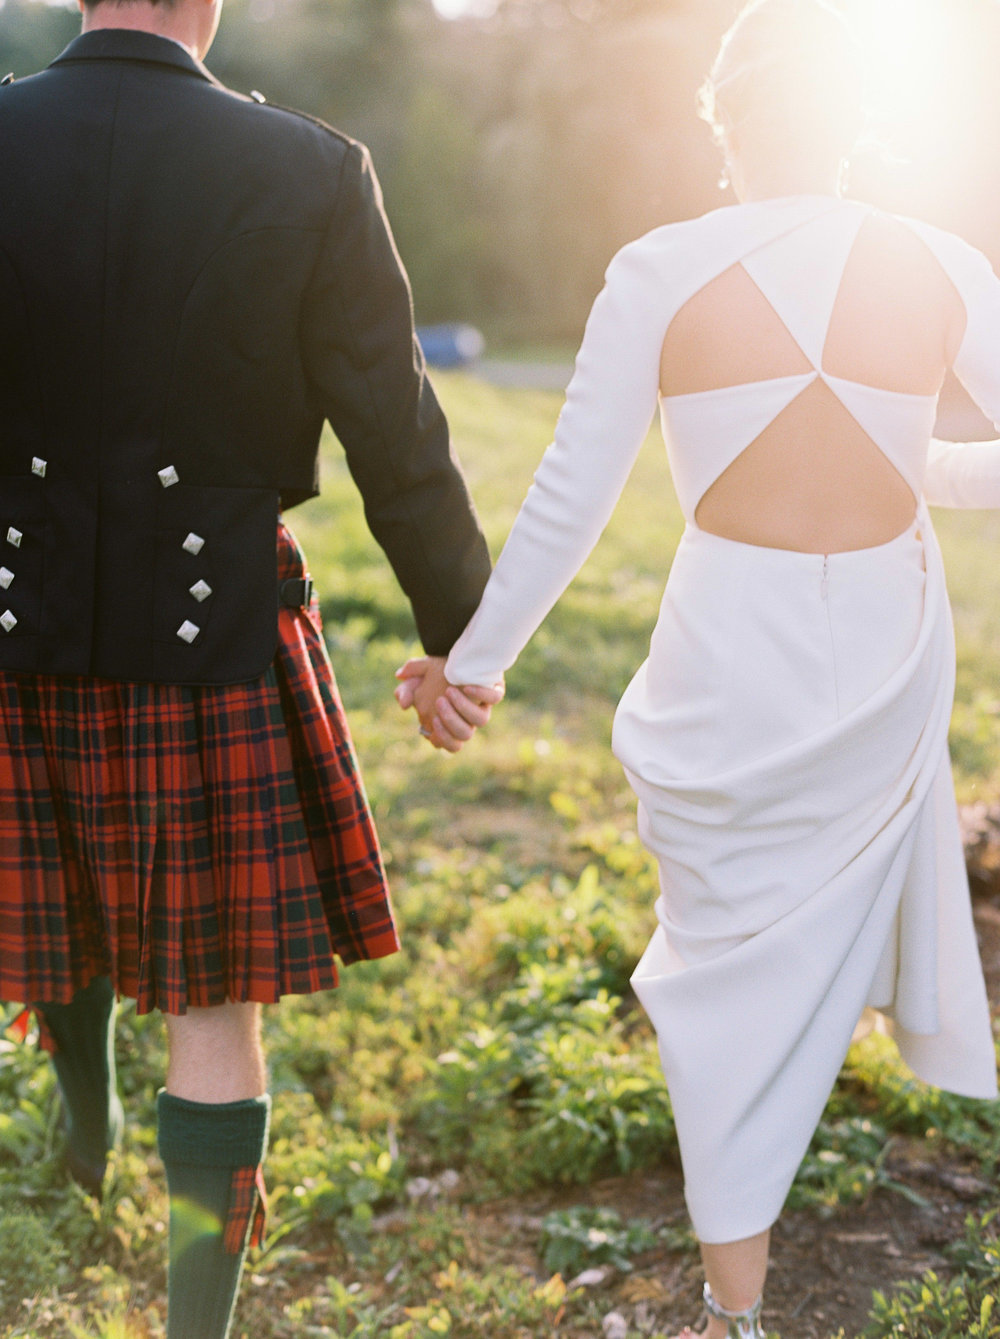 0582-Geneva-Ian-Wedding-Toronto Golf Club-When He Found Her-TorontoPhotographer.jpg